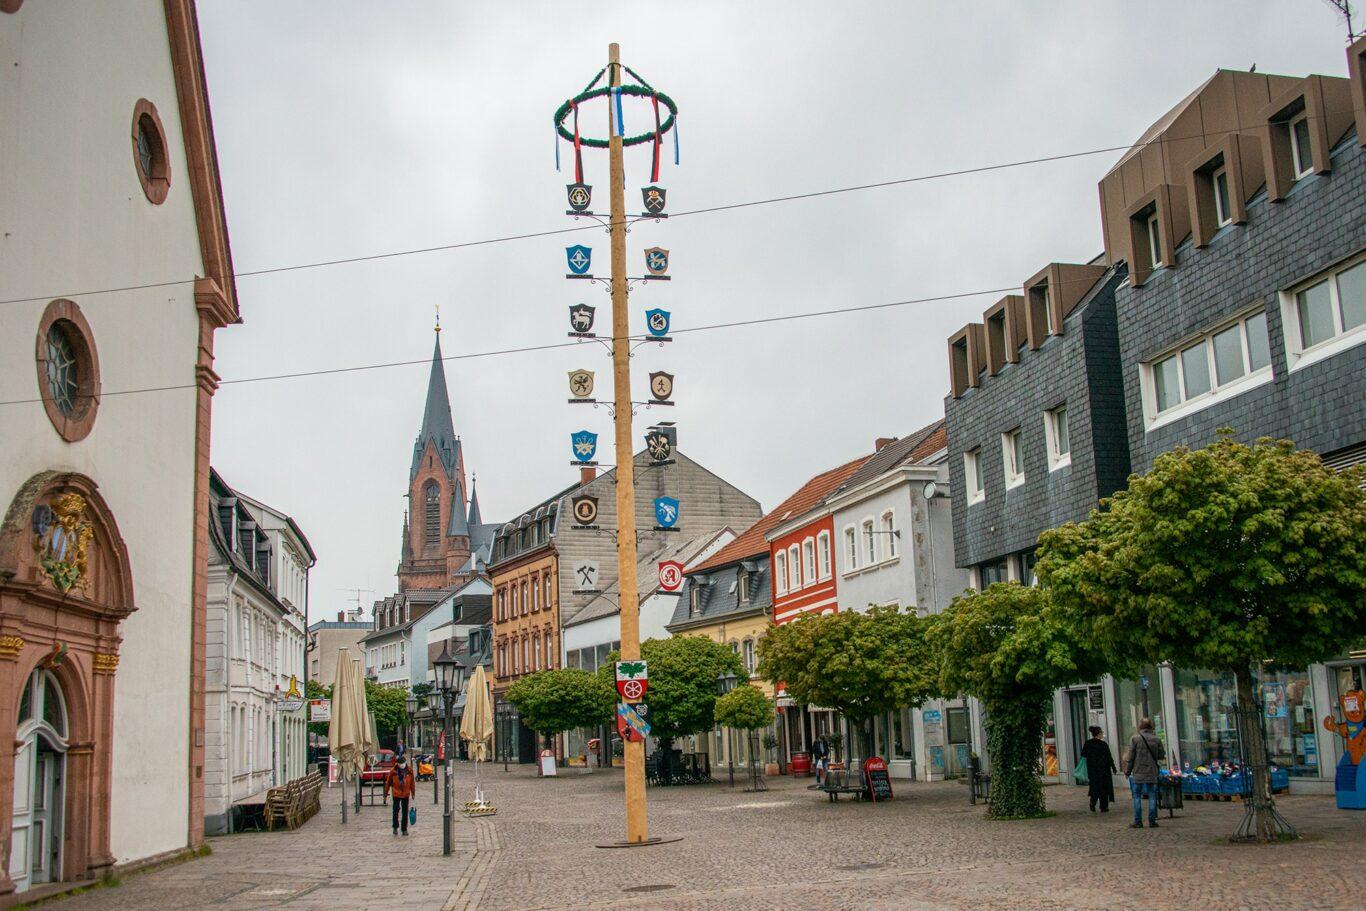 Maibaum 2021 in St. Ingbert | Bild: Nicolas Kraeber